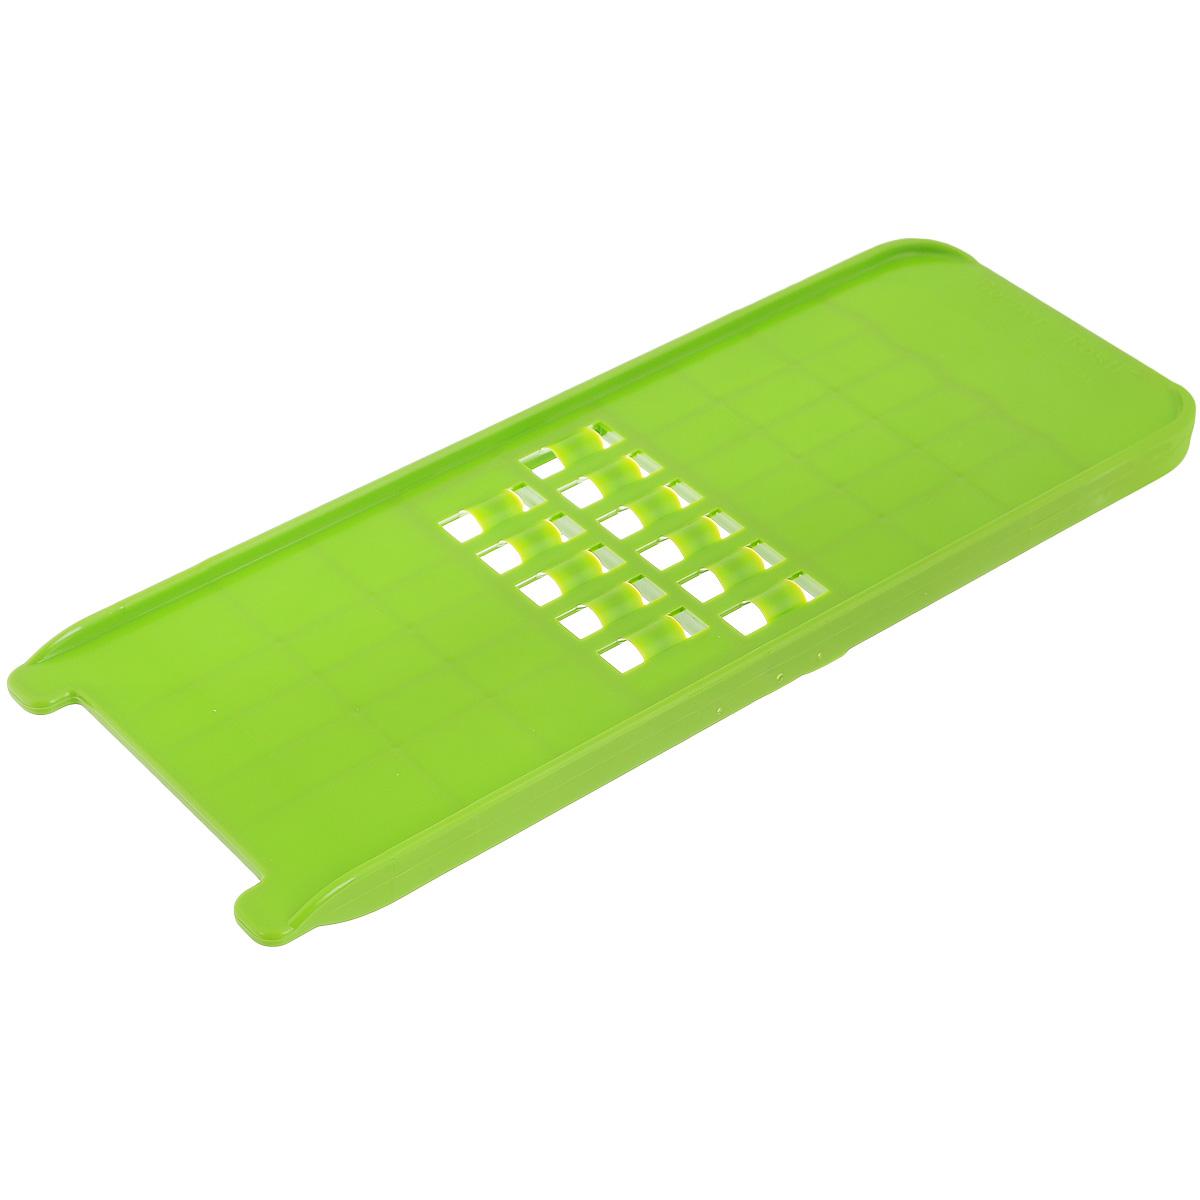 Терка-овощерезка Borner, цвет: зеленый, 10 х 26,5 х 1,5 см borner набор классика orange